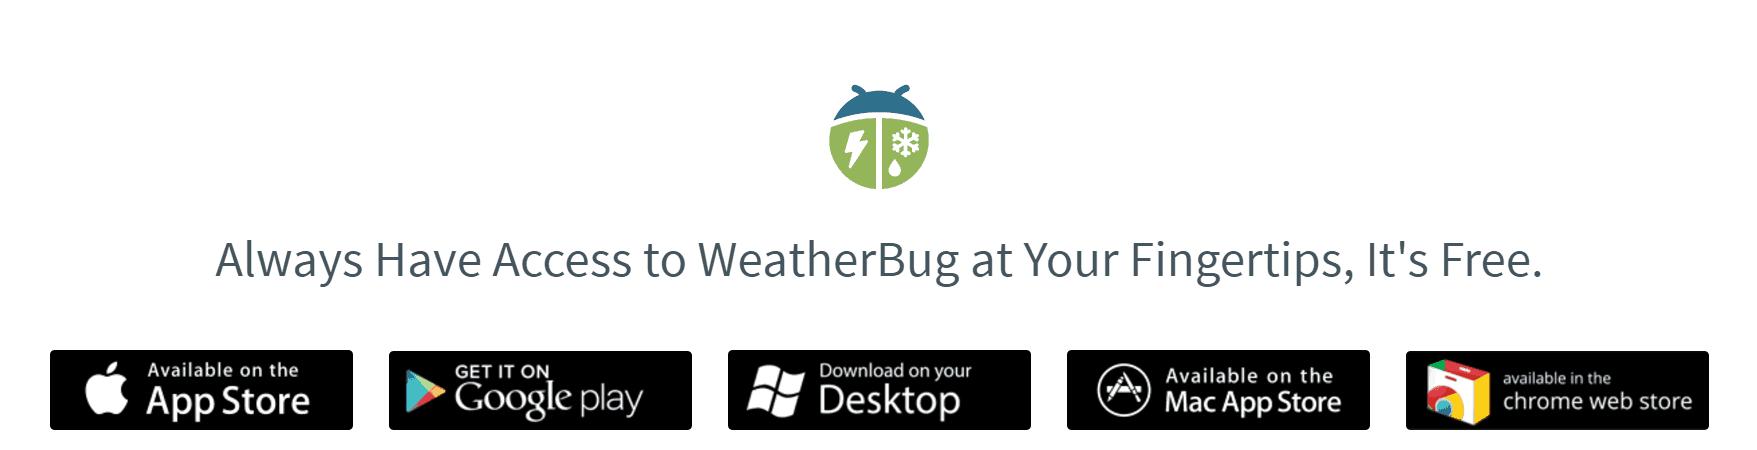 Free IOS & Droid Weather App - AmongTech